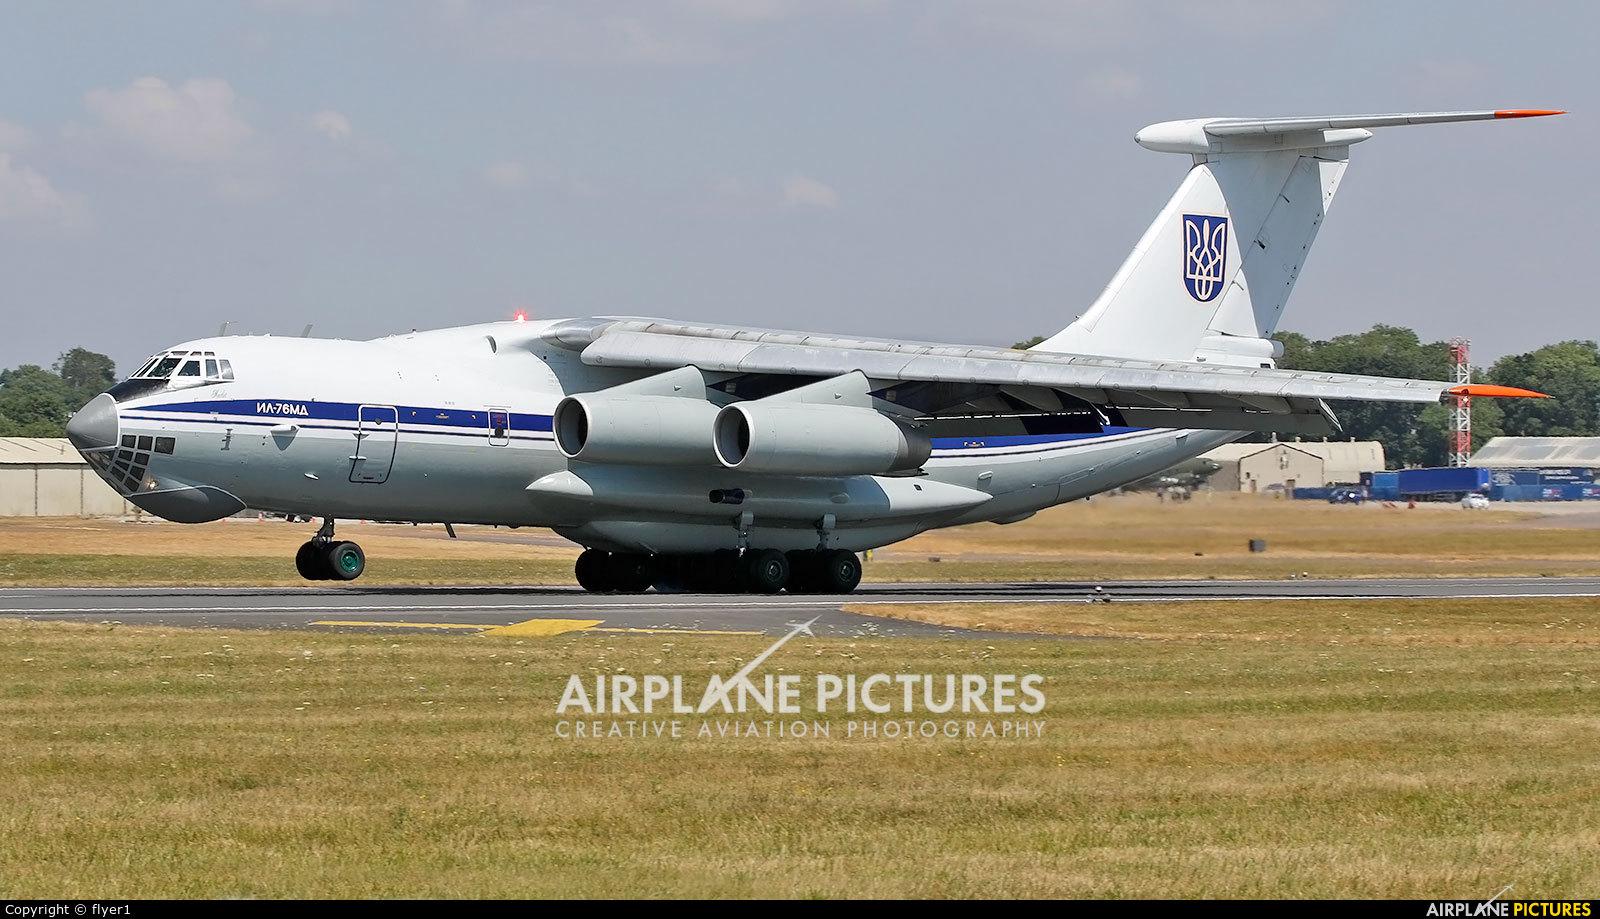 Ukraine - Air Force 78820 aircraft at Fairford